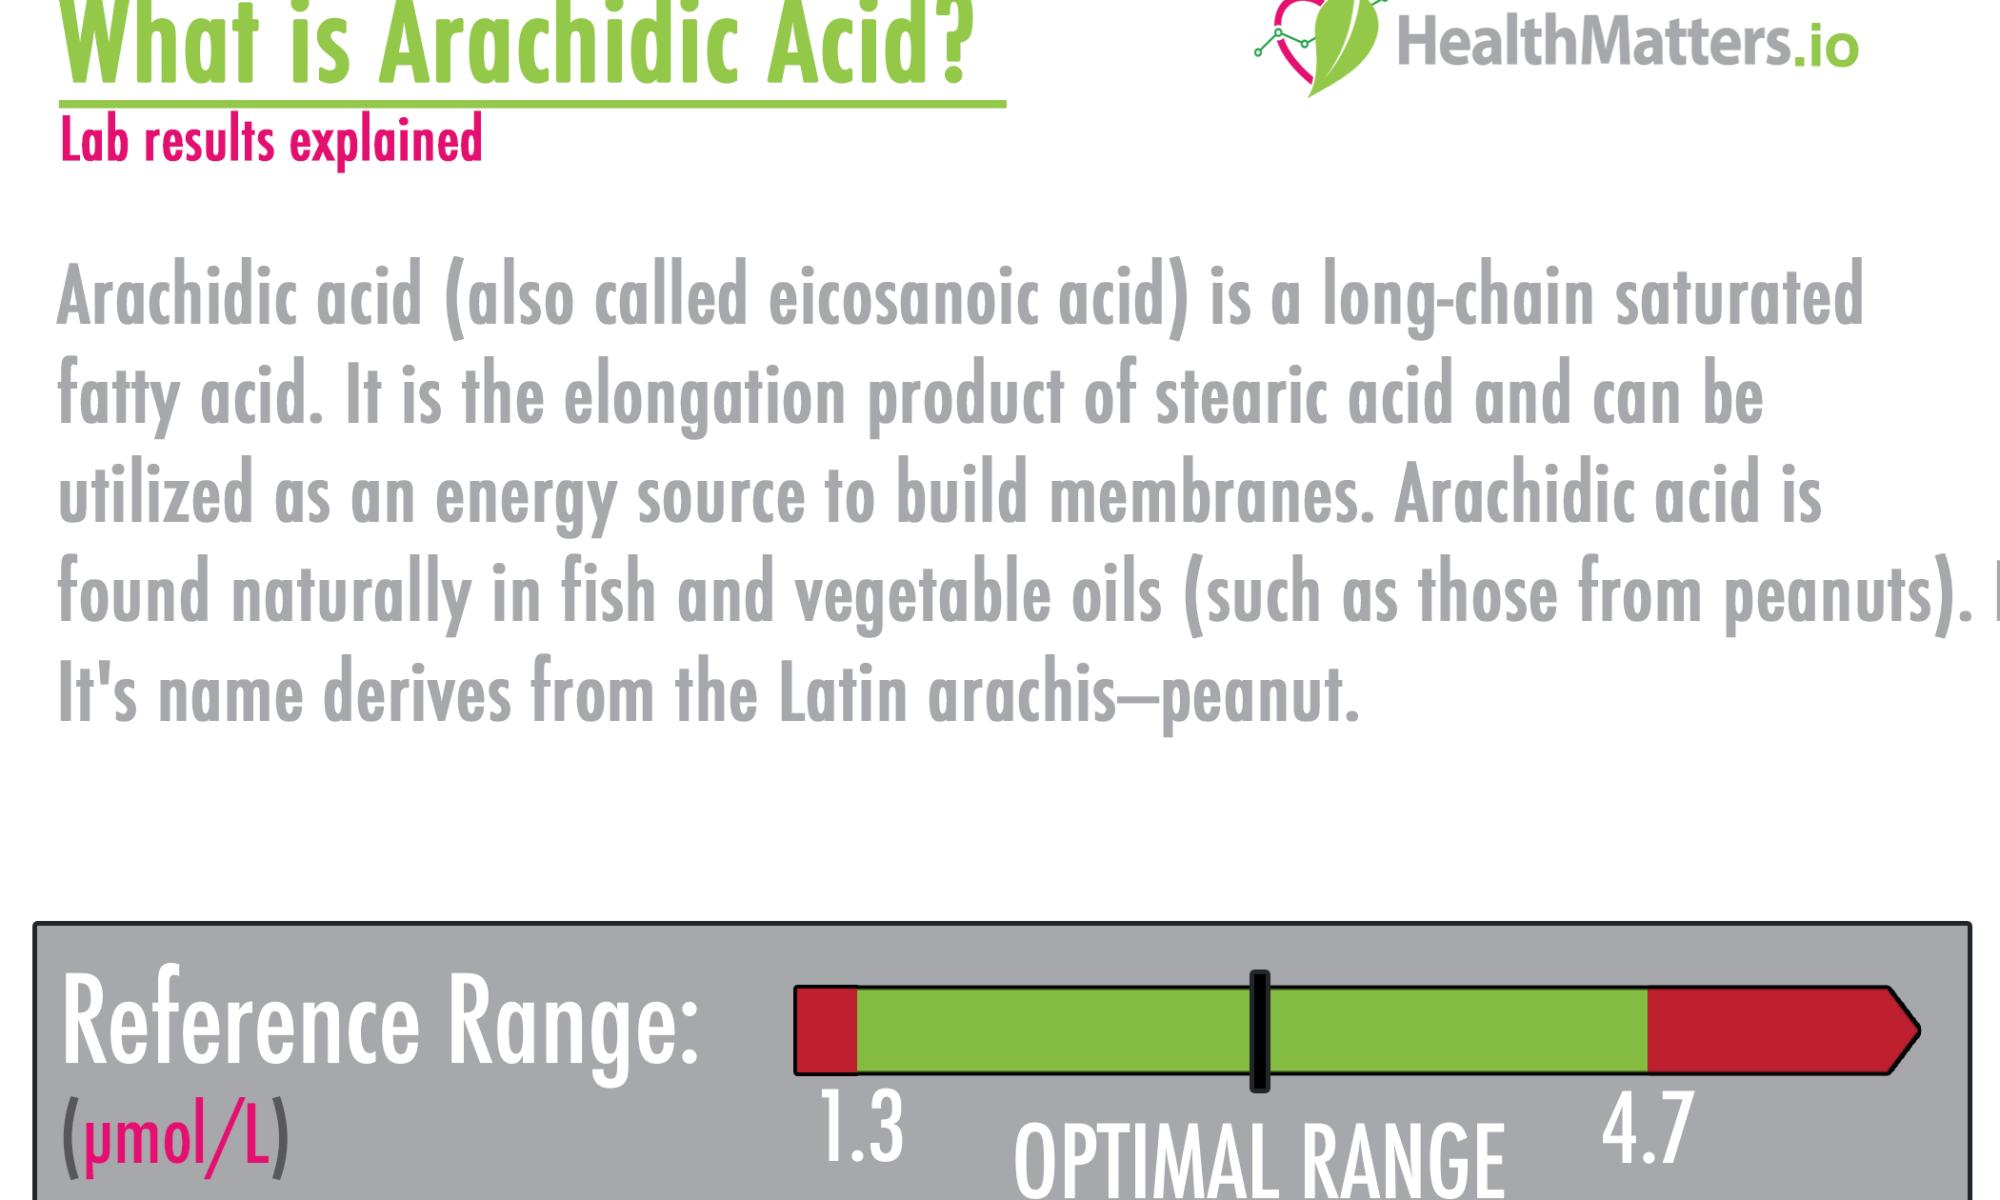 arachidic acid healthmatters.io high low meaning symptoms treatment interpretation genova gdx.net